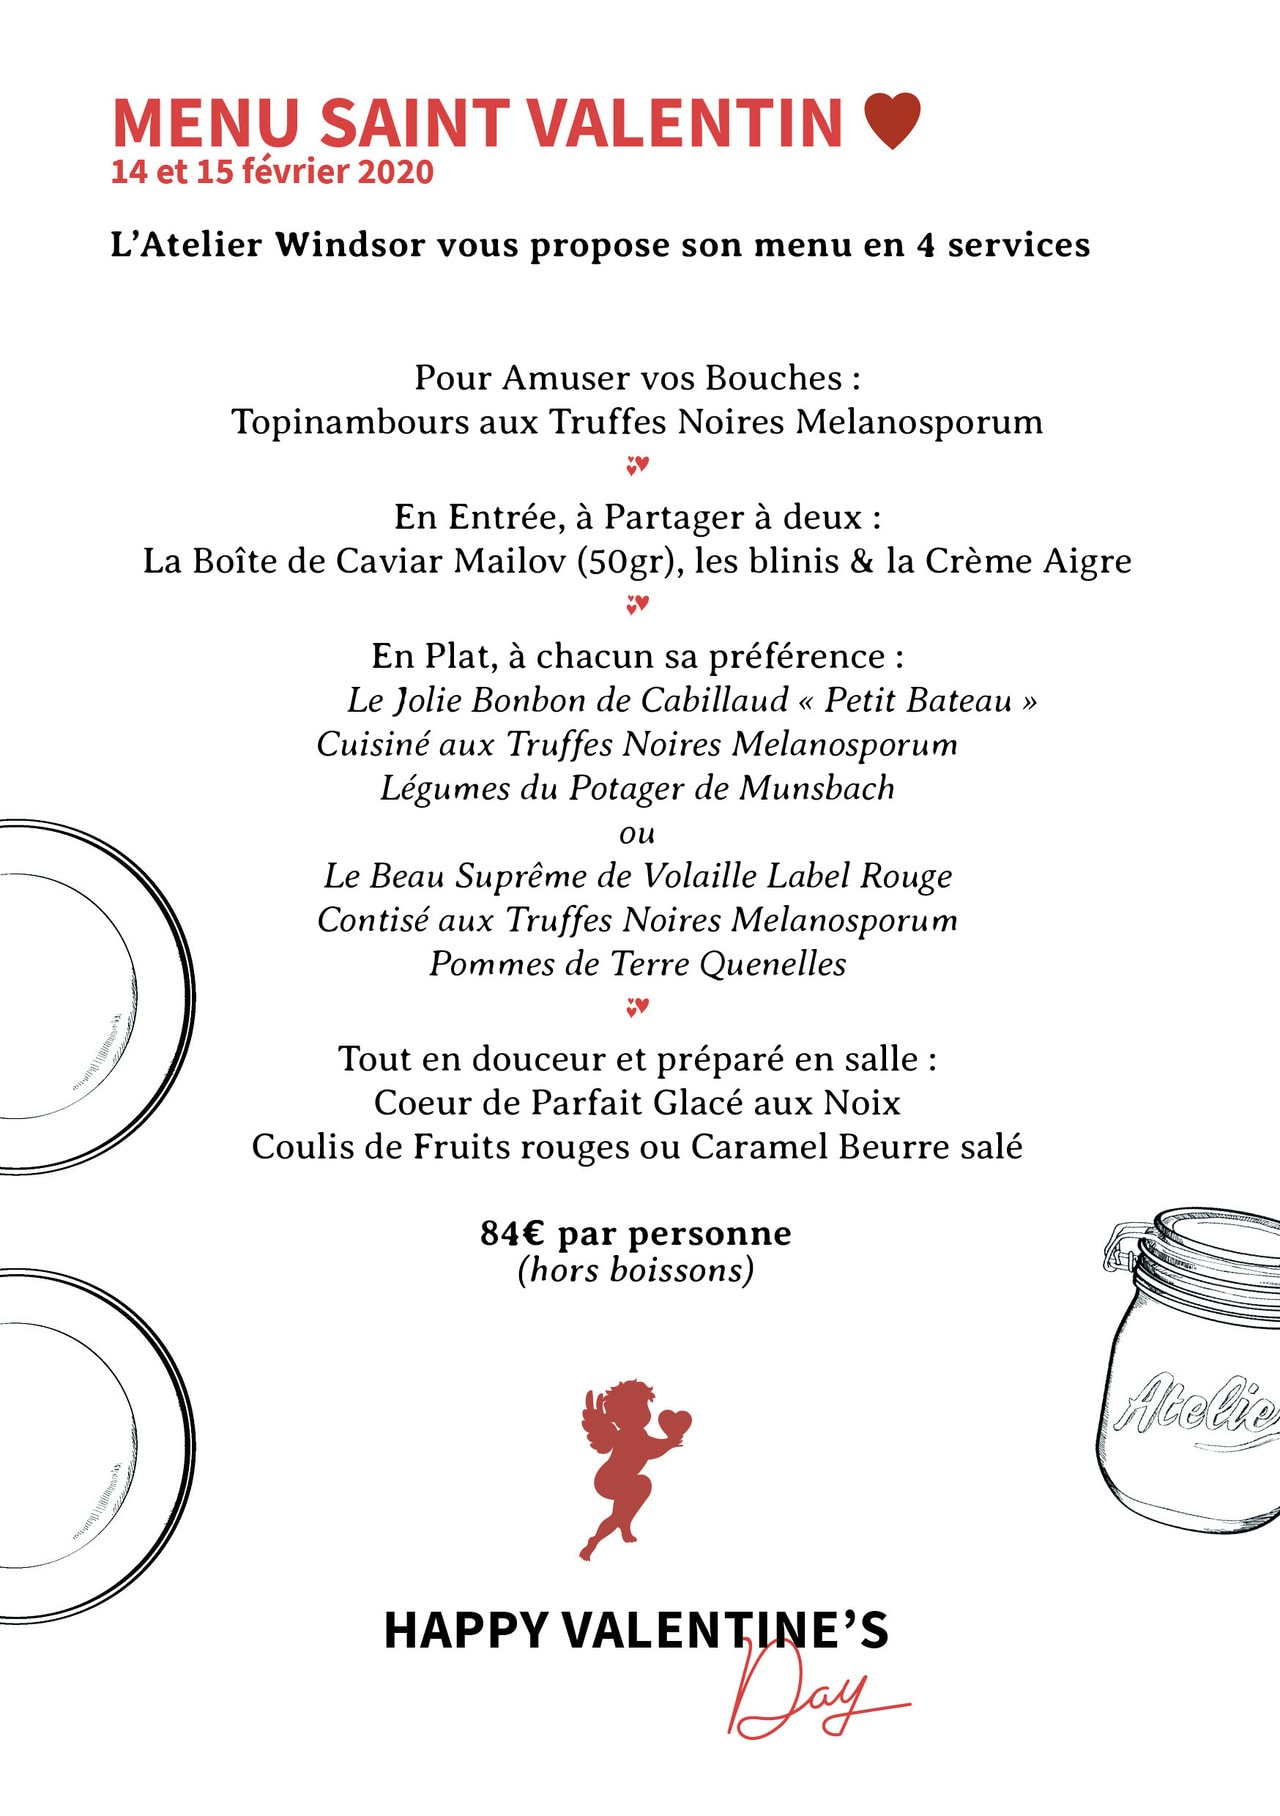 menu de la Saint Valentin 2020 Atelier Windsor Luxembourg